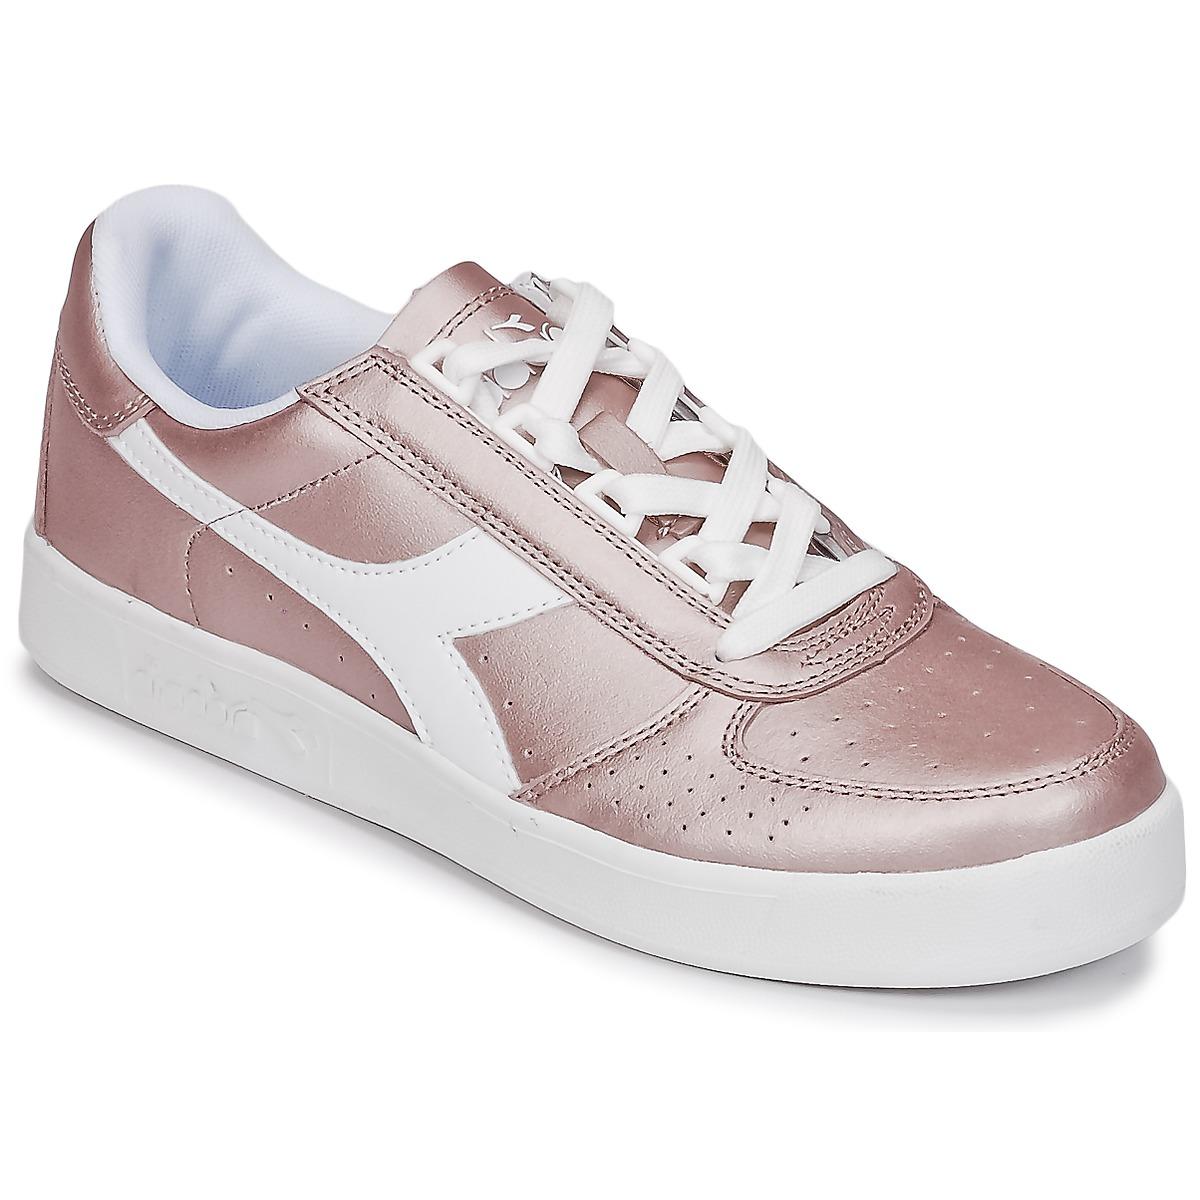 Diadora B ELITE I METALLIC WN Bronze - Kostenloser Versand bei Spartoode ! - Schuhe Sneaker Low Damen 53,99 €